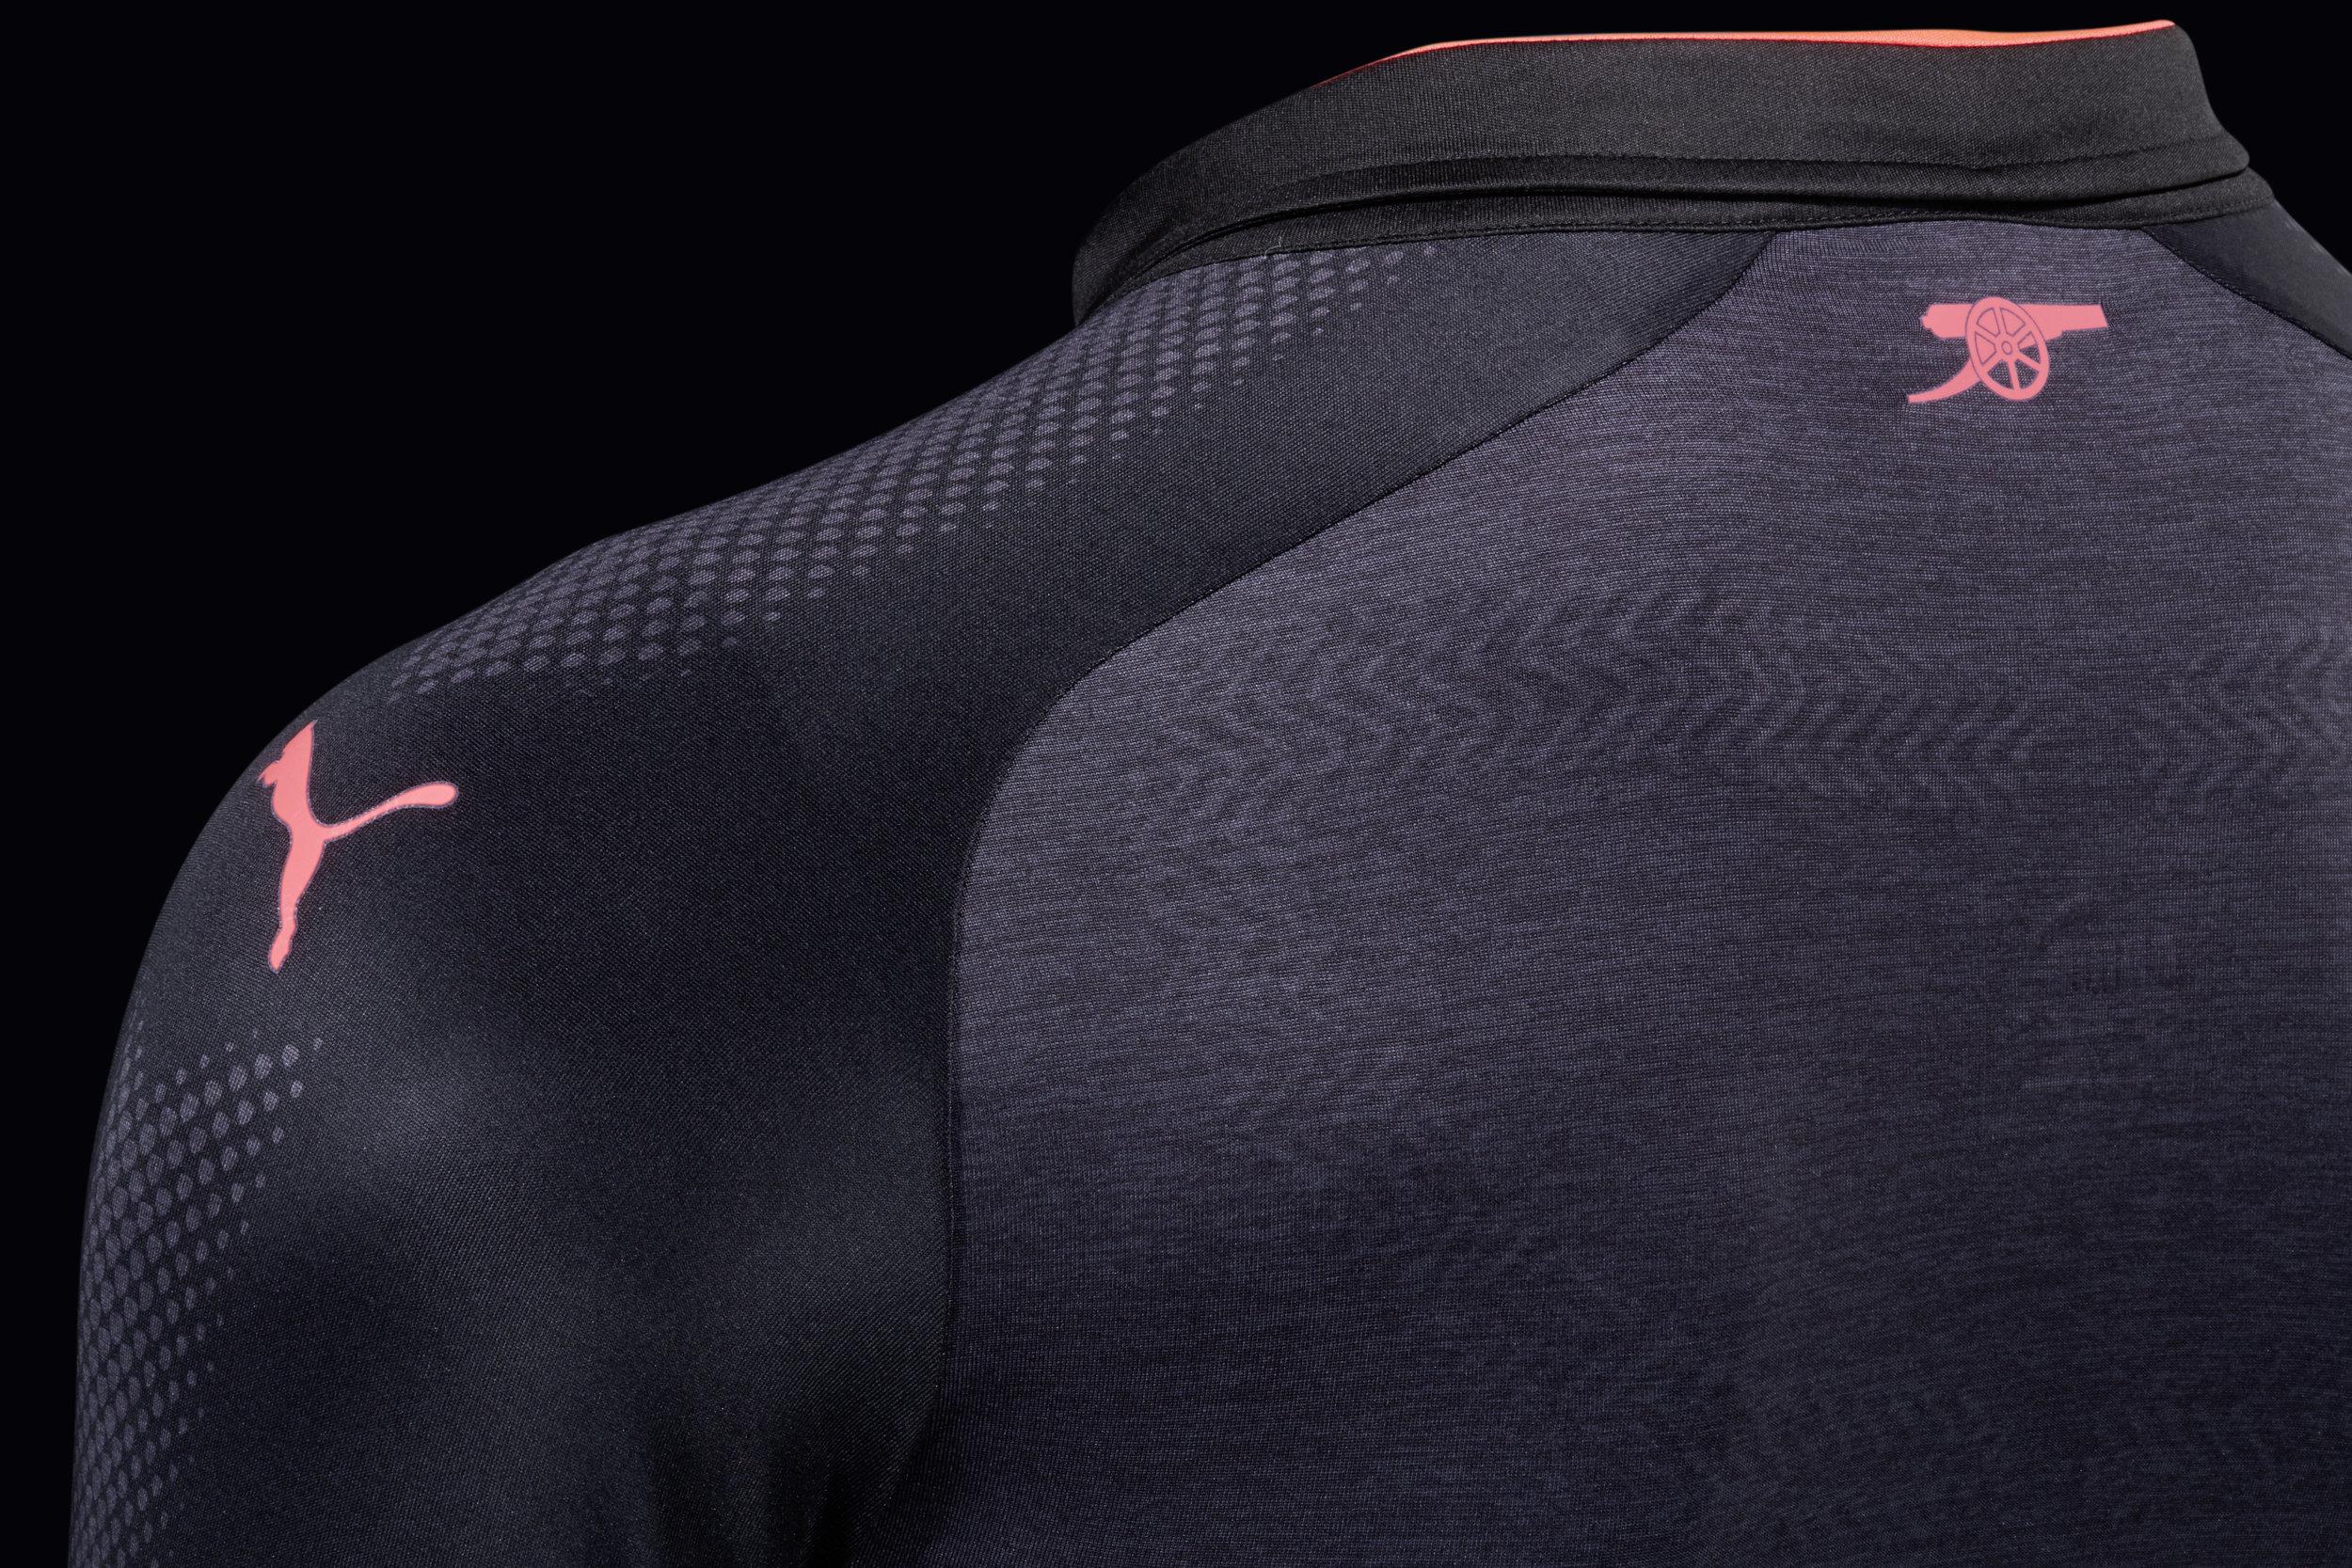 17AW_PR_TS_Football_Step-Out_Shirt-Details-Arsenal_2.jpg